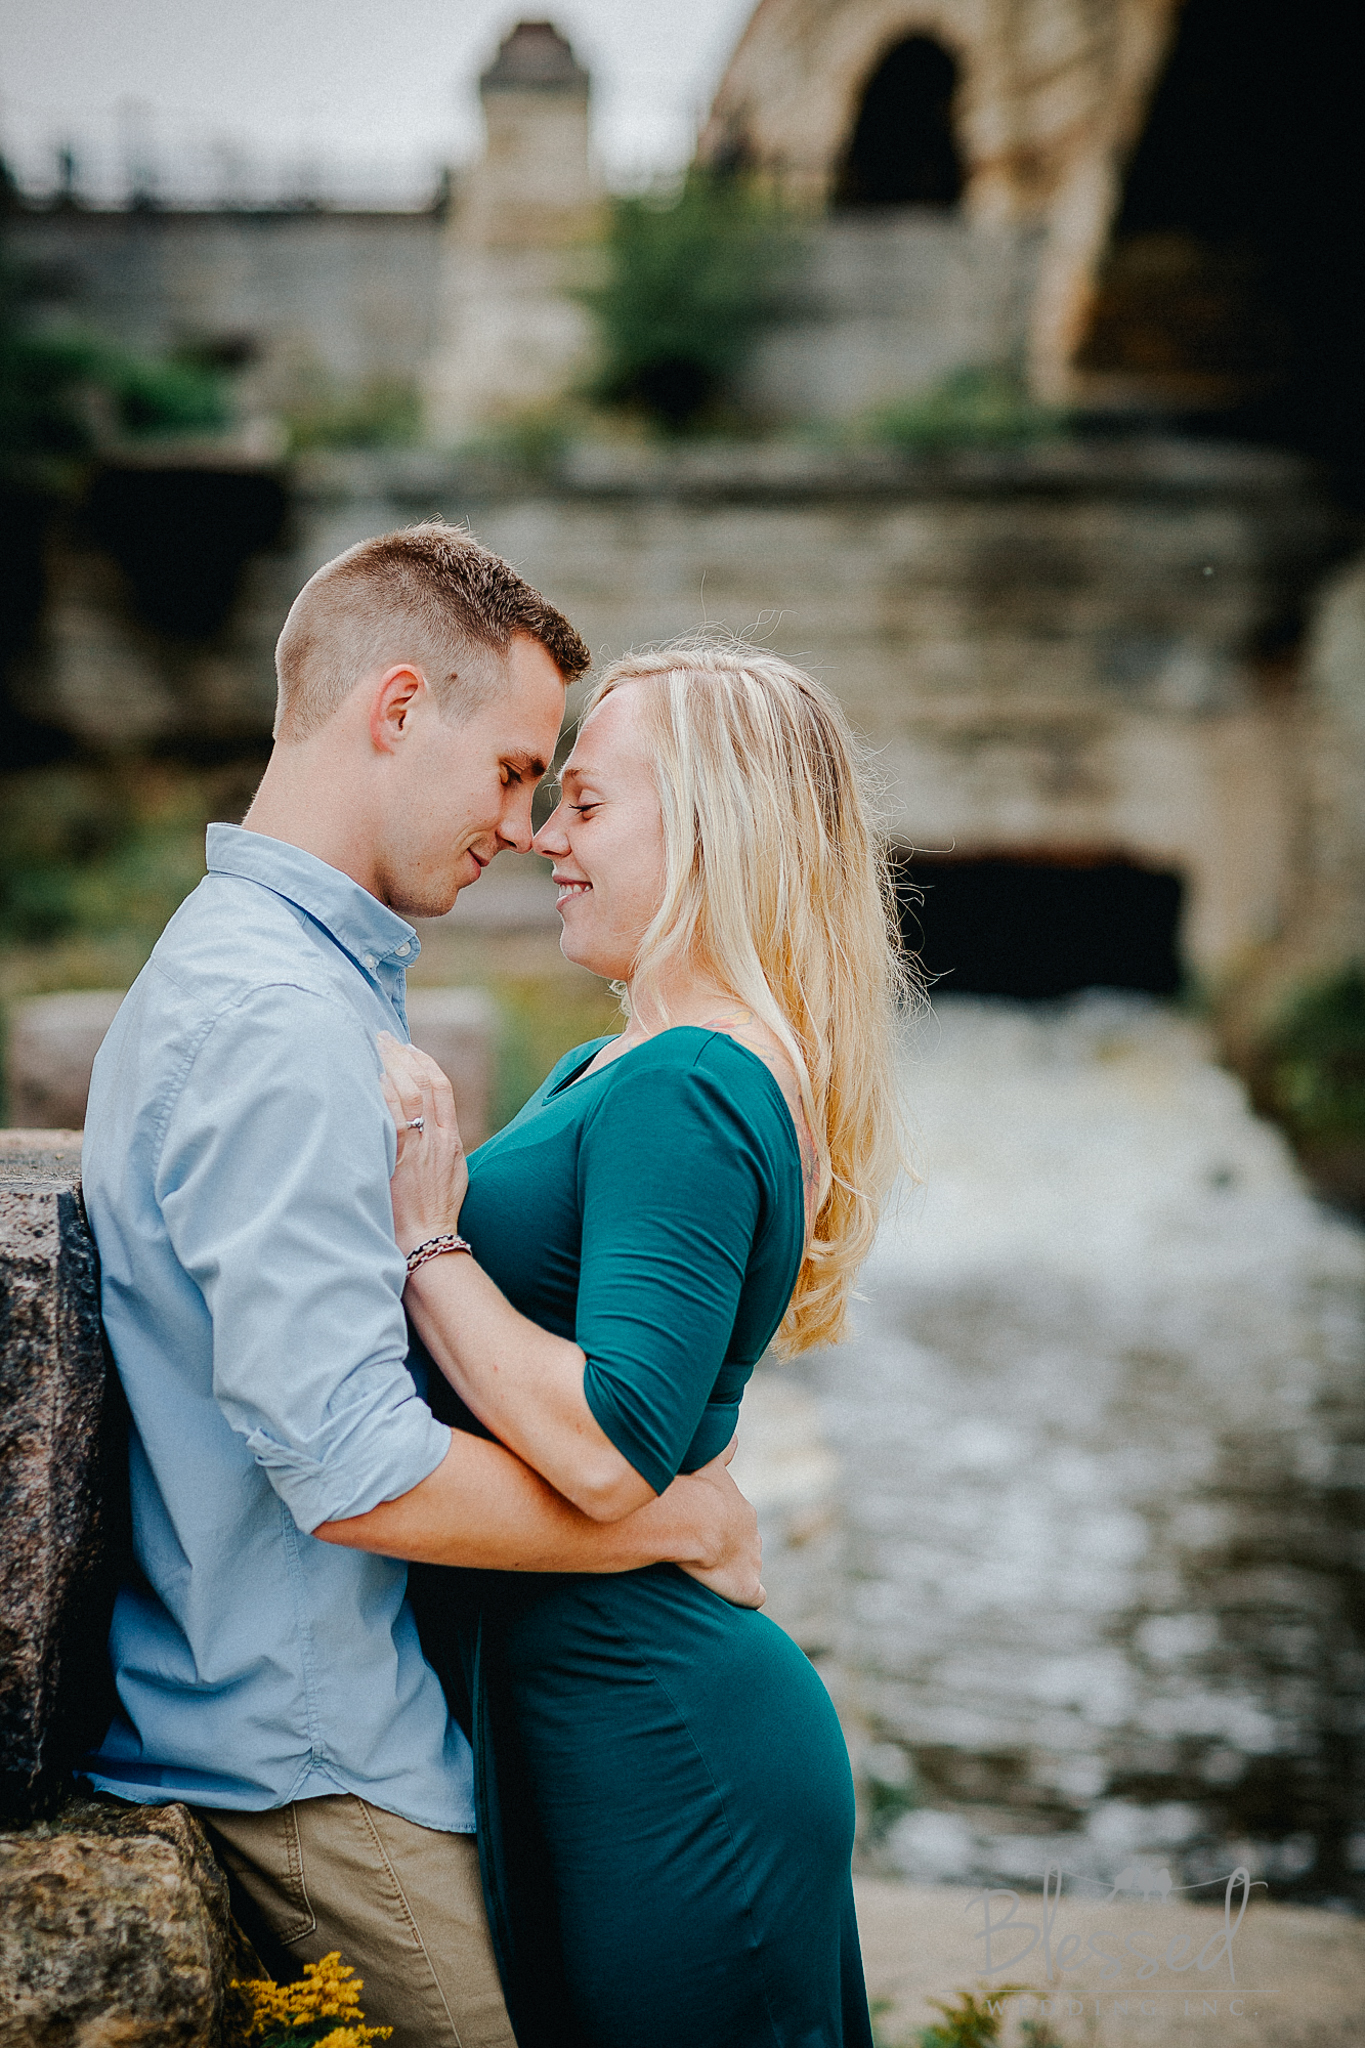 Destination Wedding Photography Minnesota By Blessed Wedding Photographers-3.jpg